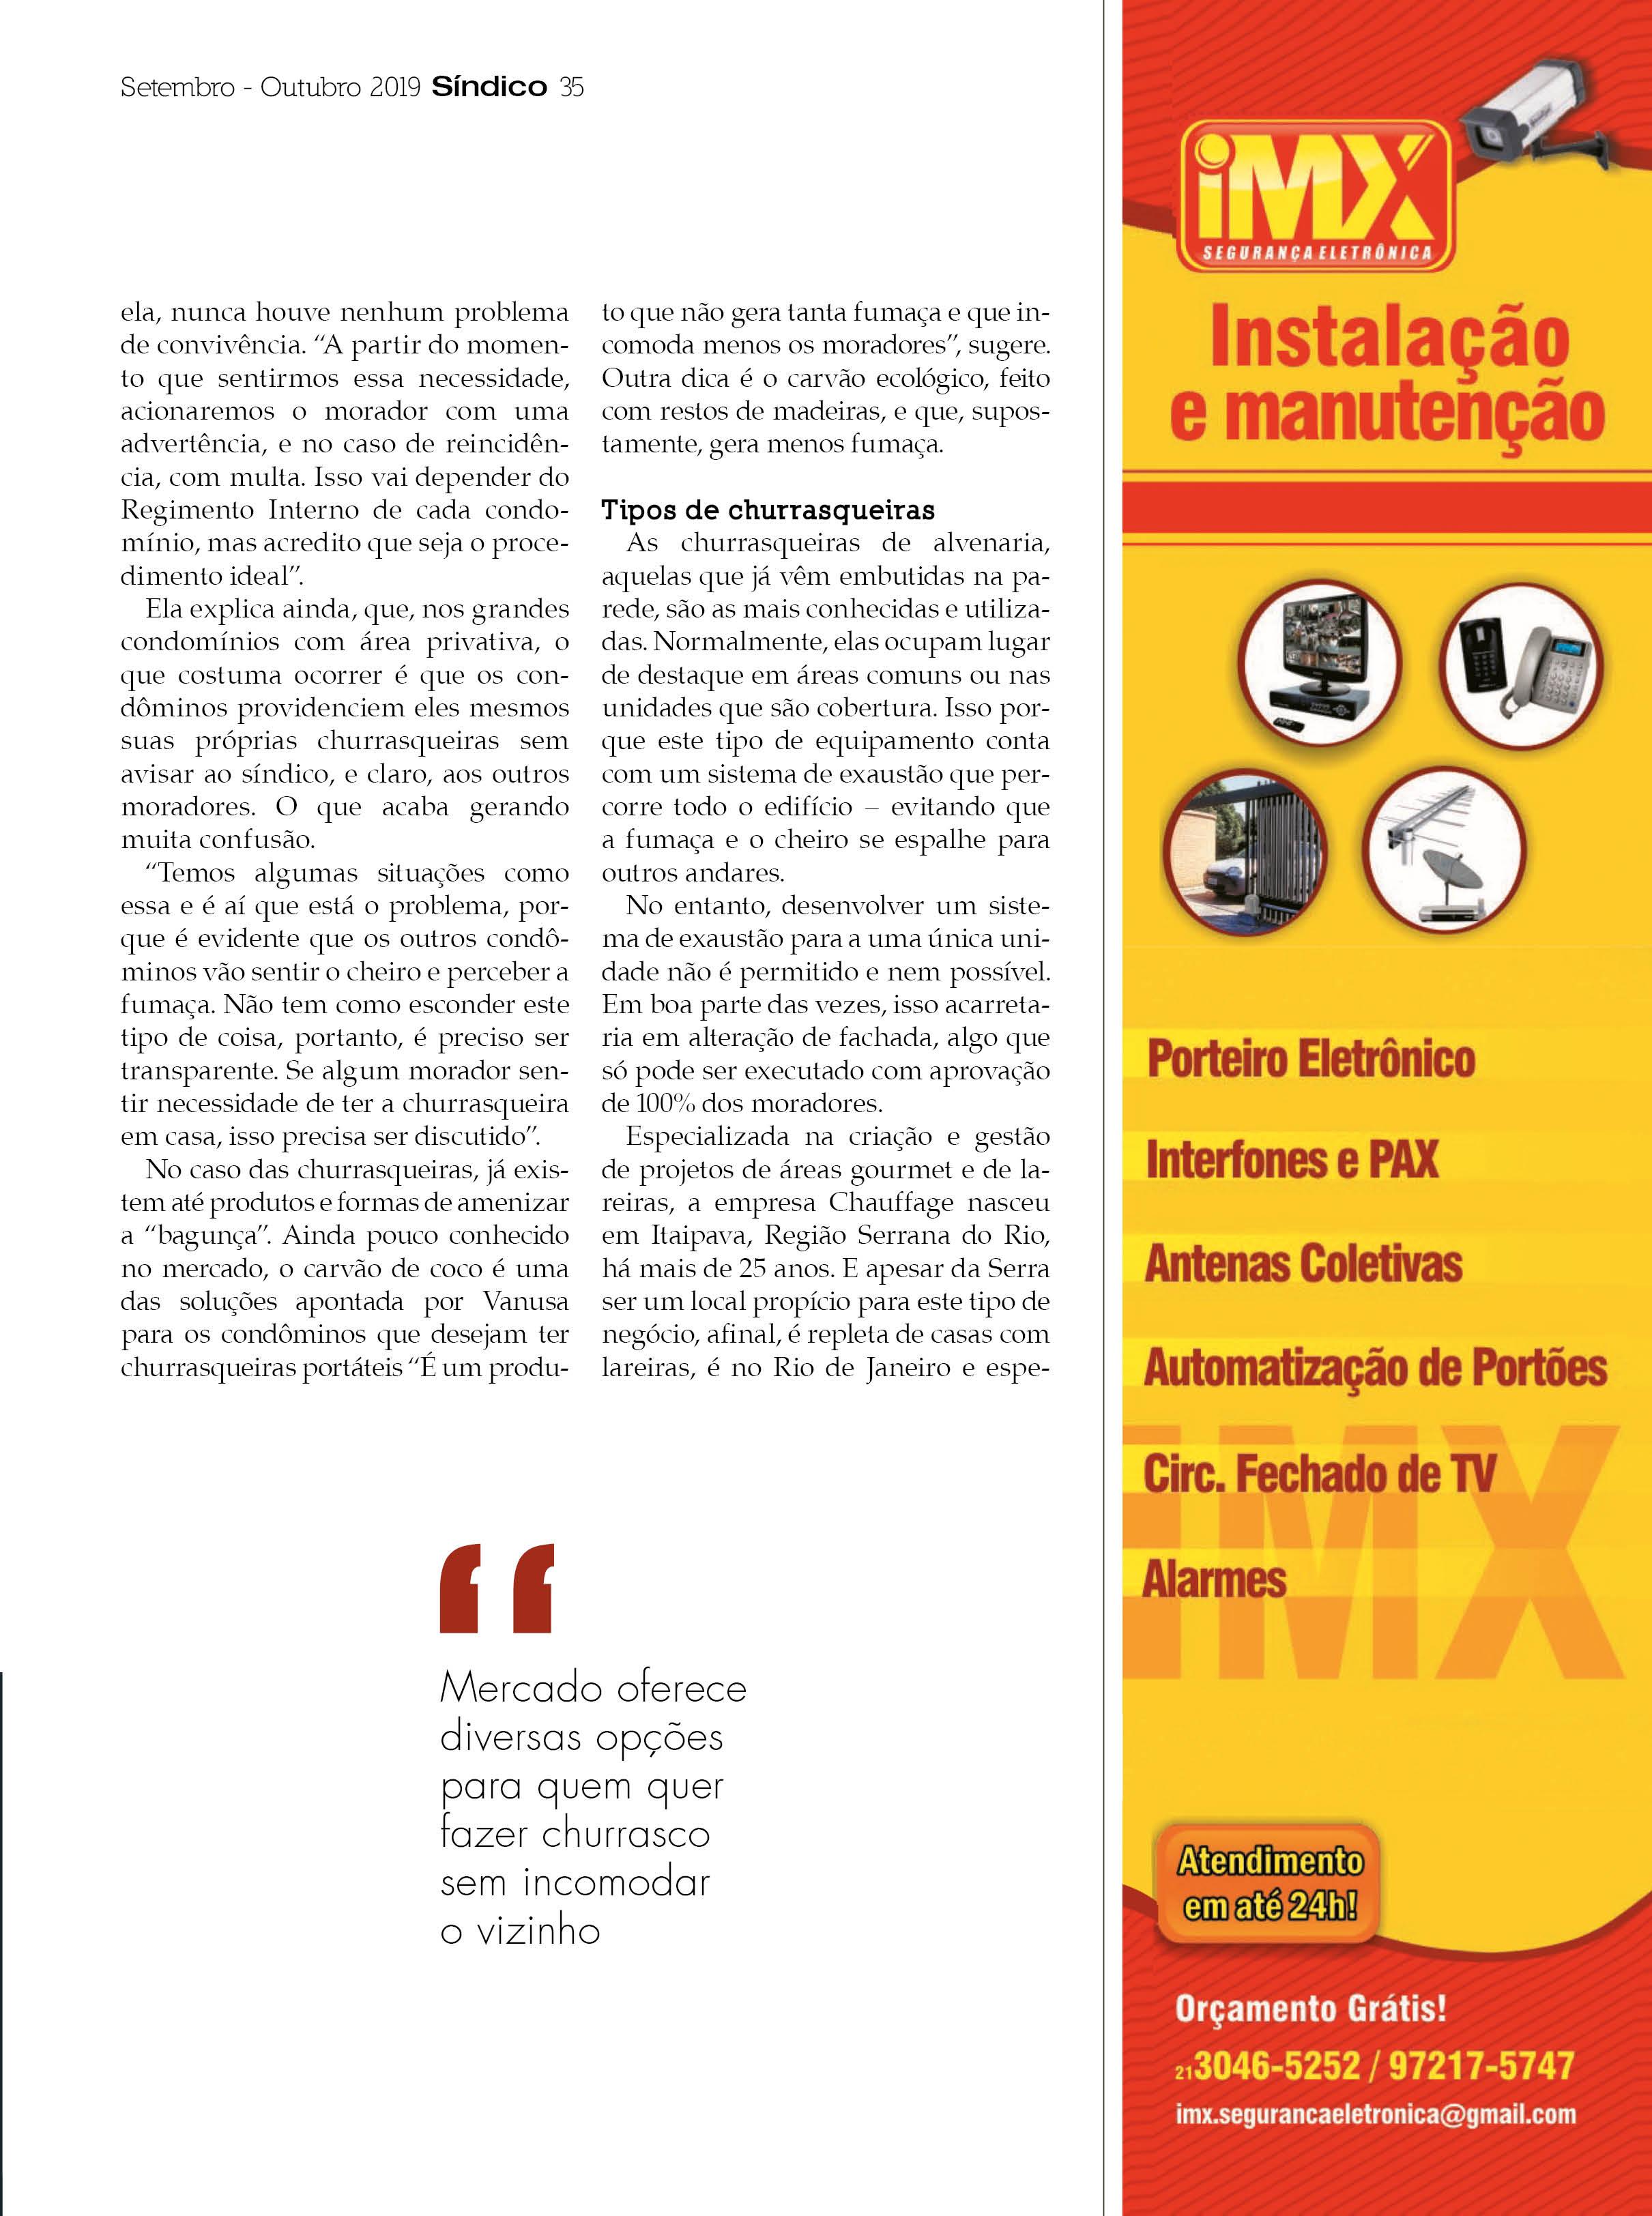 Revista Síndico_ed 246_33